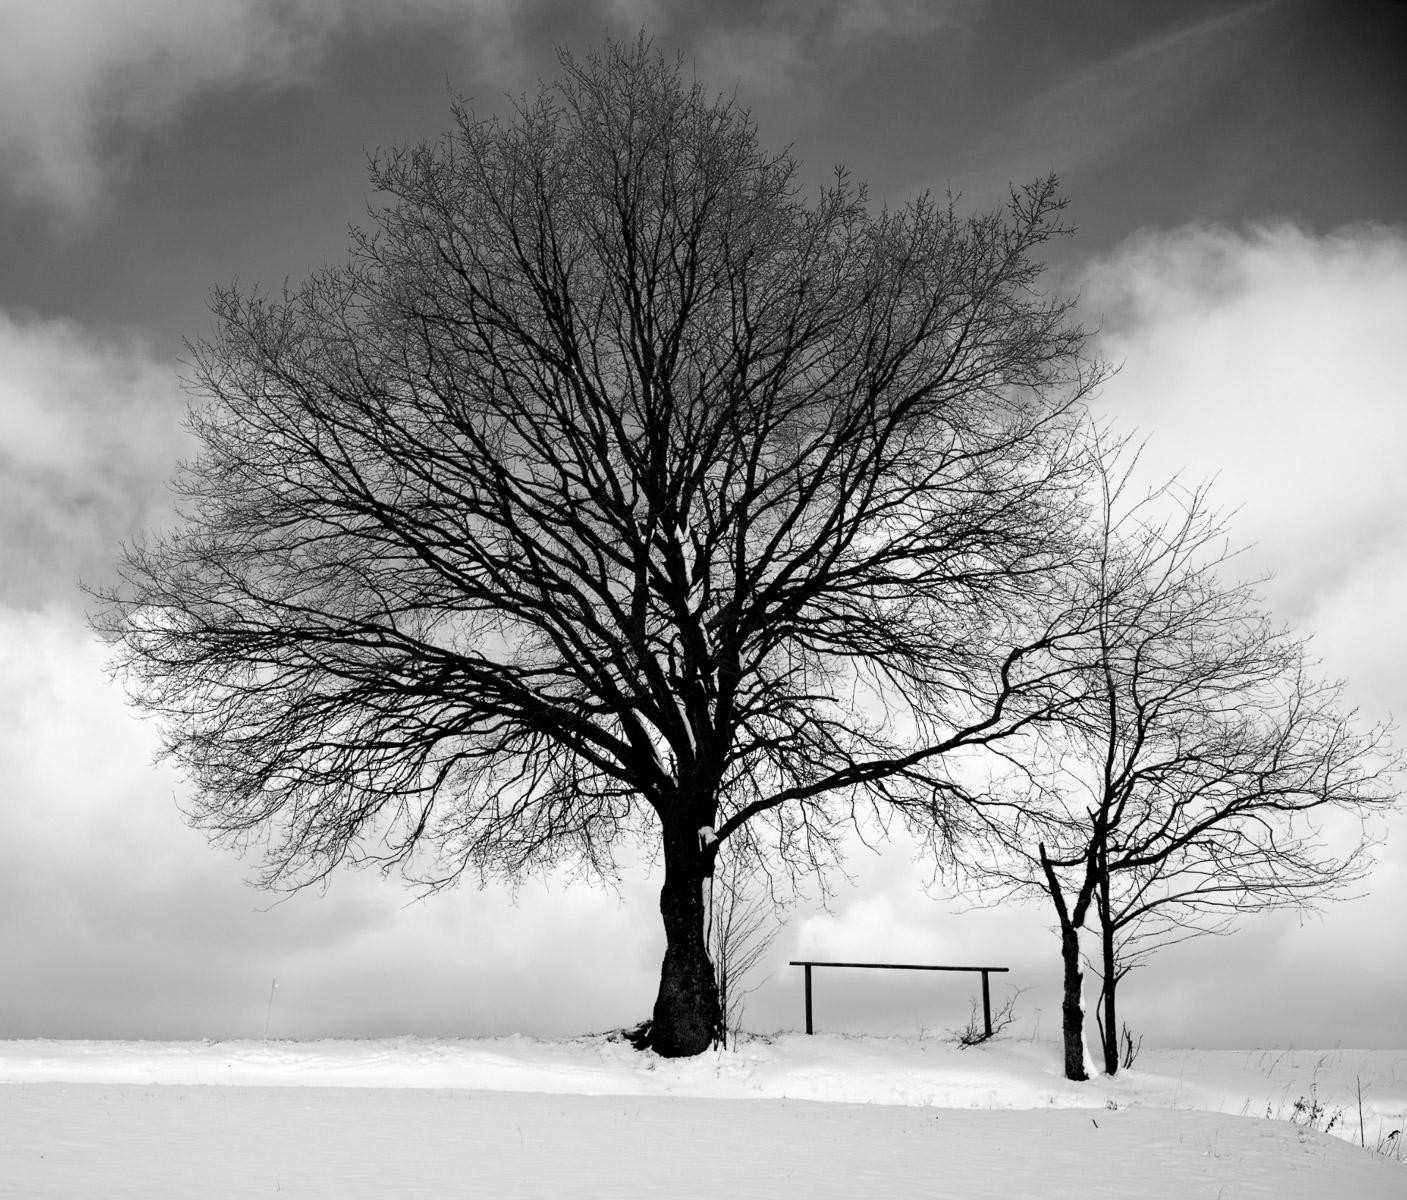 Der Baum (Foto: Danielle Switala)